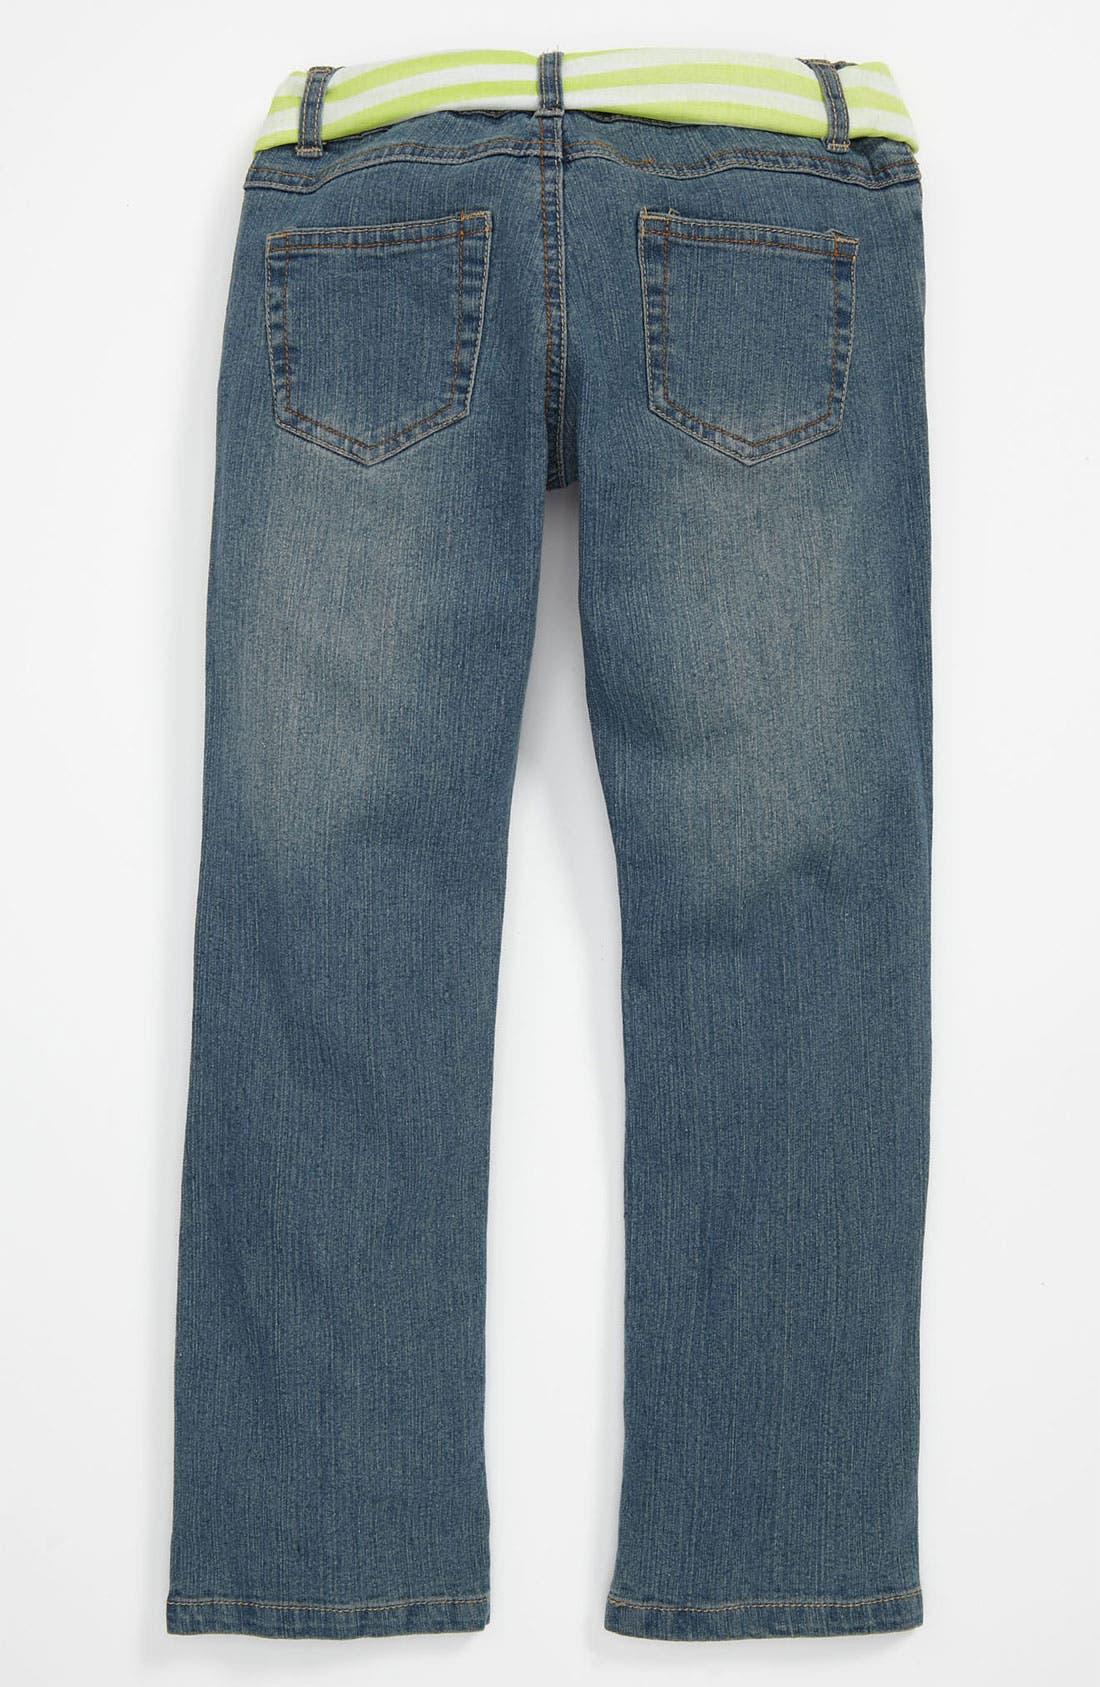 Alternate Image 2  - Pumpkin Patch Embroidered Denim Jeans (Little Girls & Big Girls)